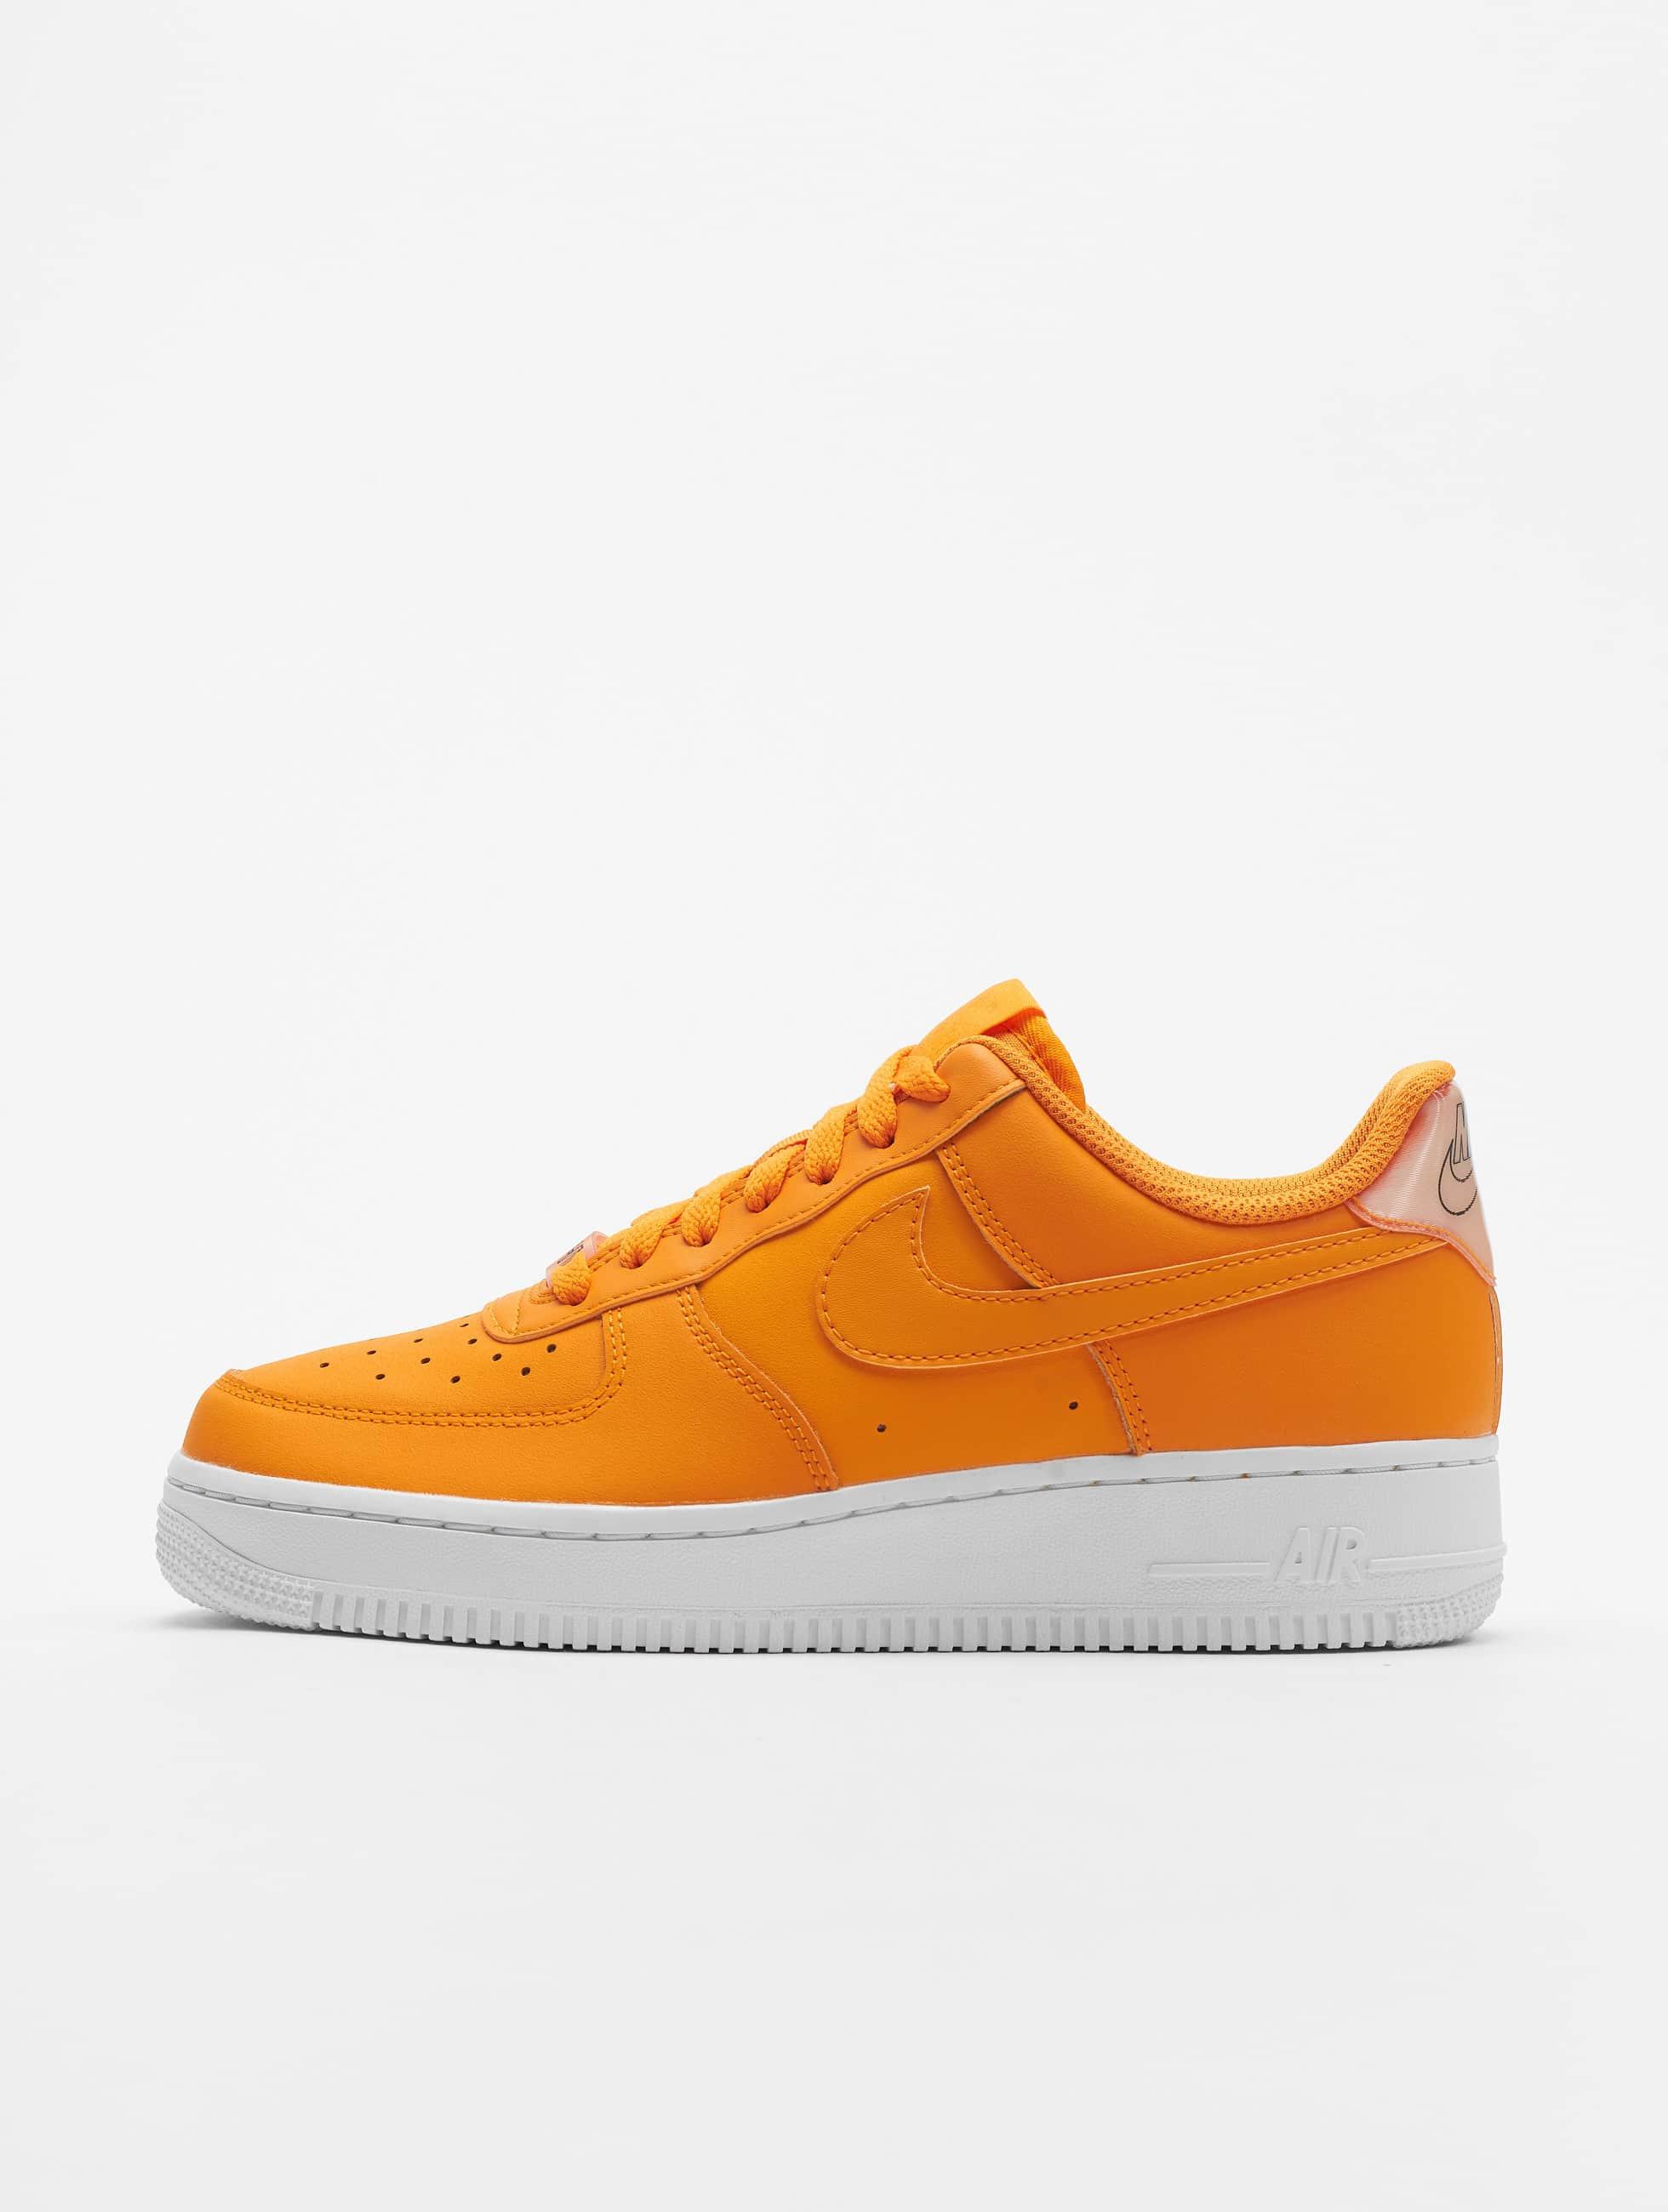 nike air force orange